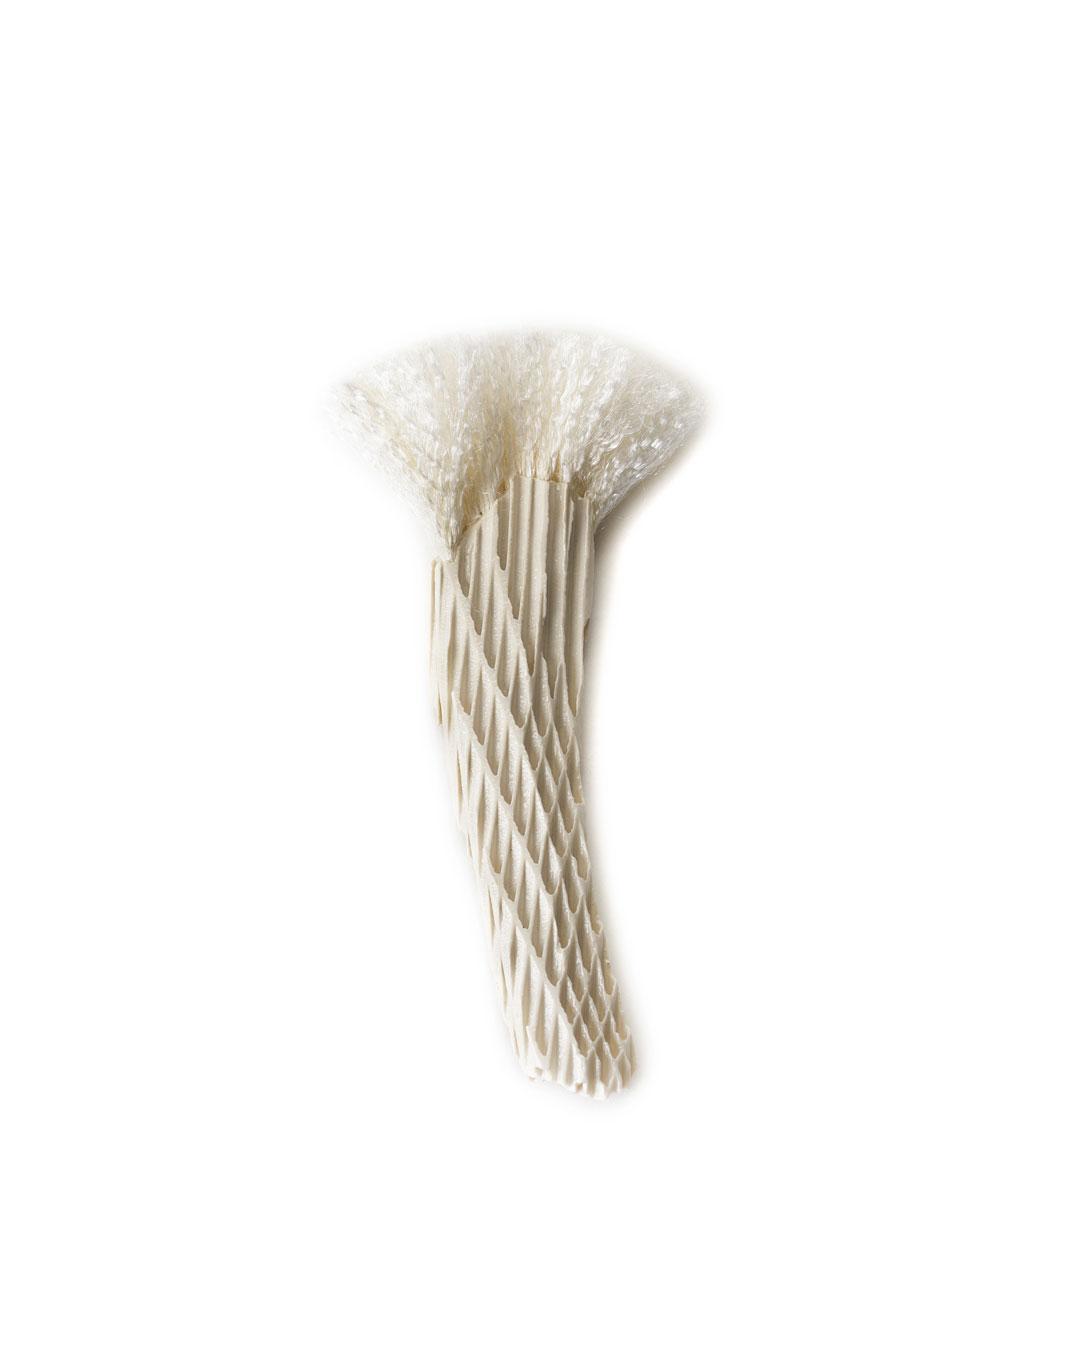 Silke Trekel, Homage to Meret, 2014, brooch; porcelain, silver, thread, 120 x 35 x 8 mm, €610